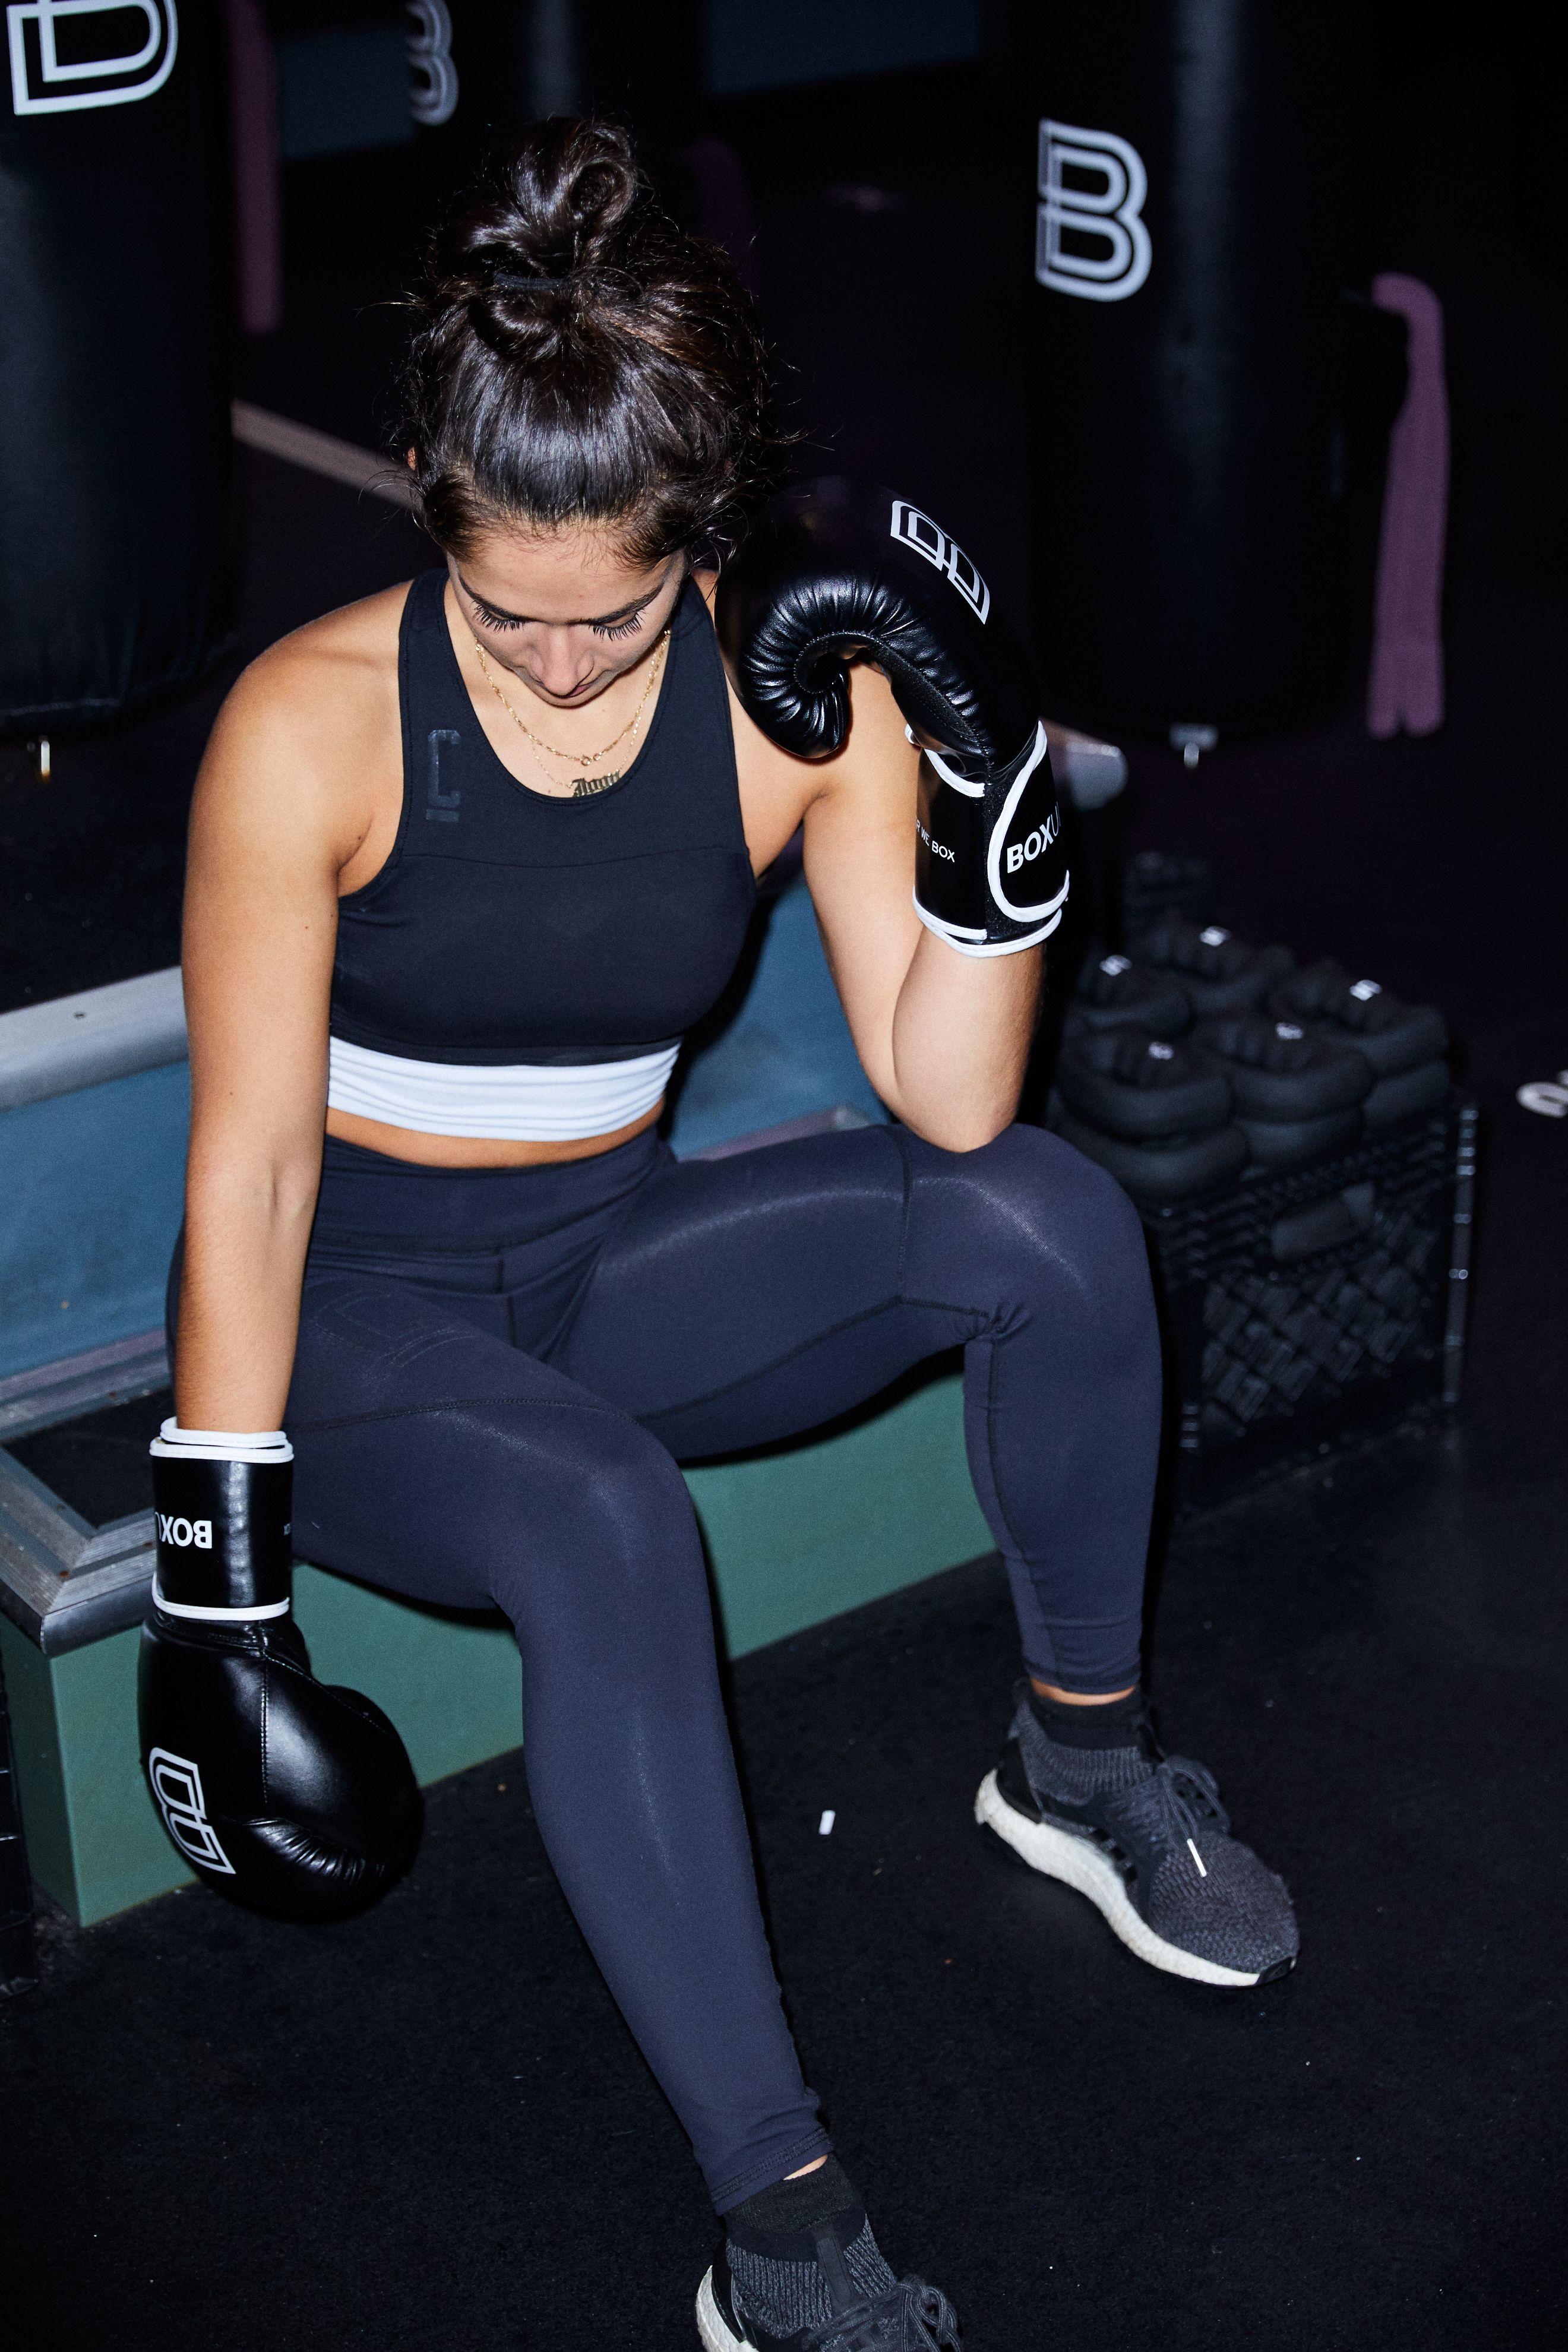 Girlswhobox image by combo boxing fitness fashion